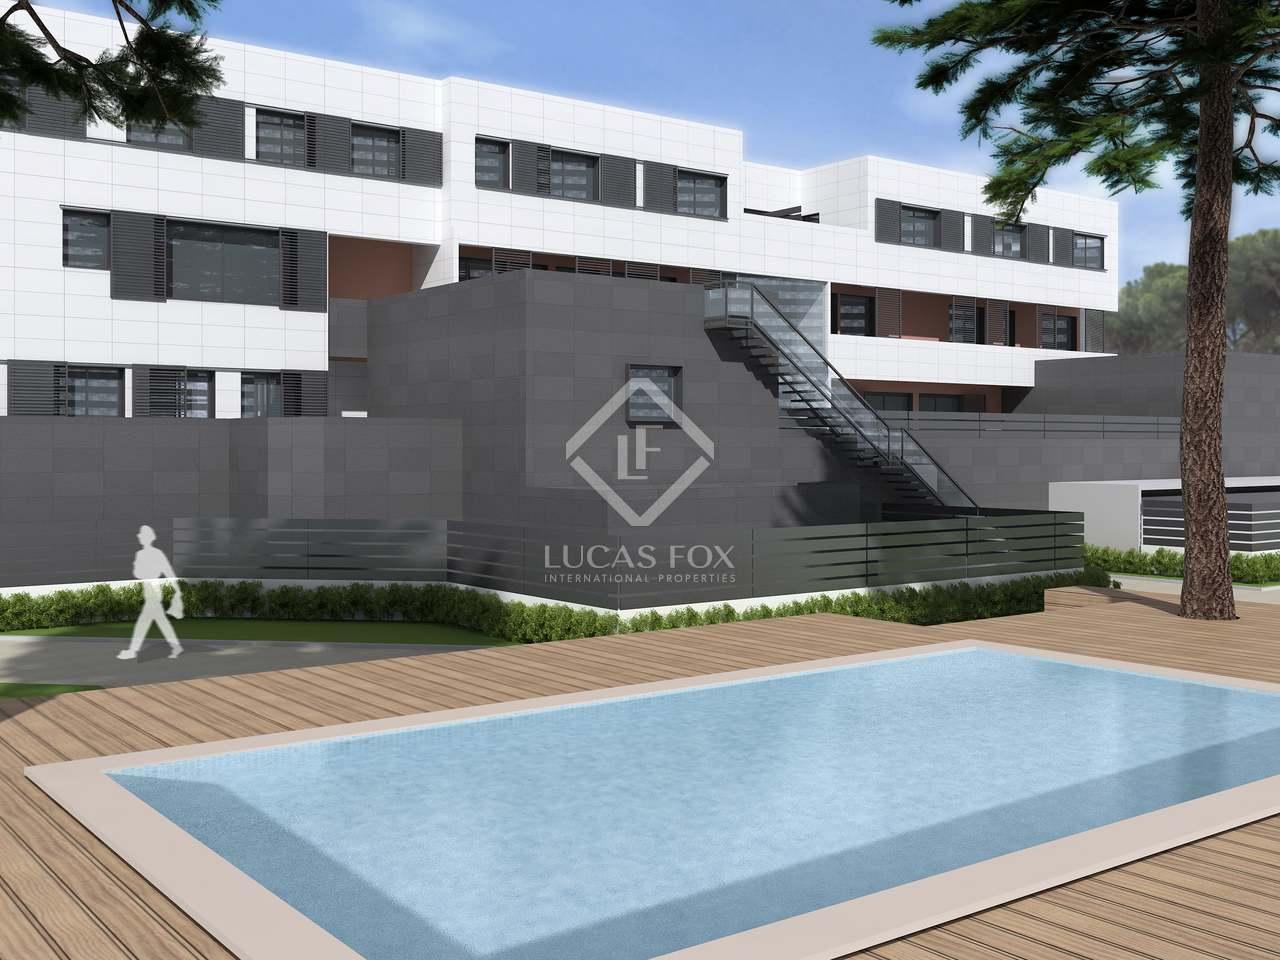 Image of the development : 1